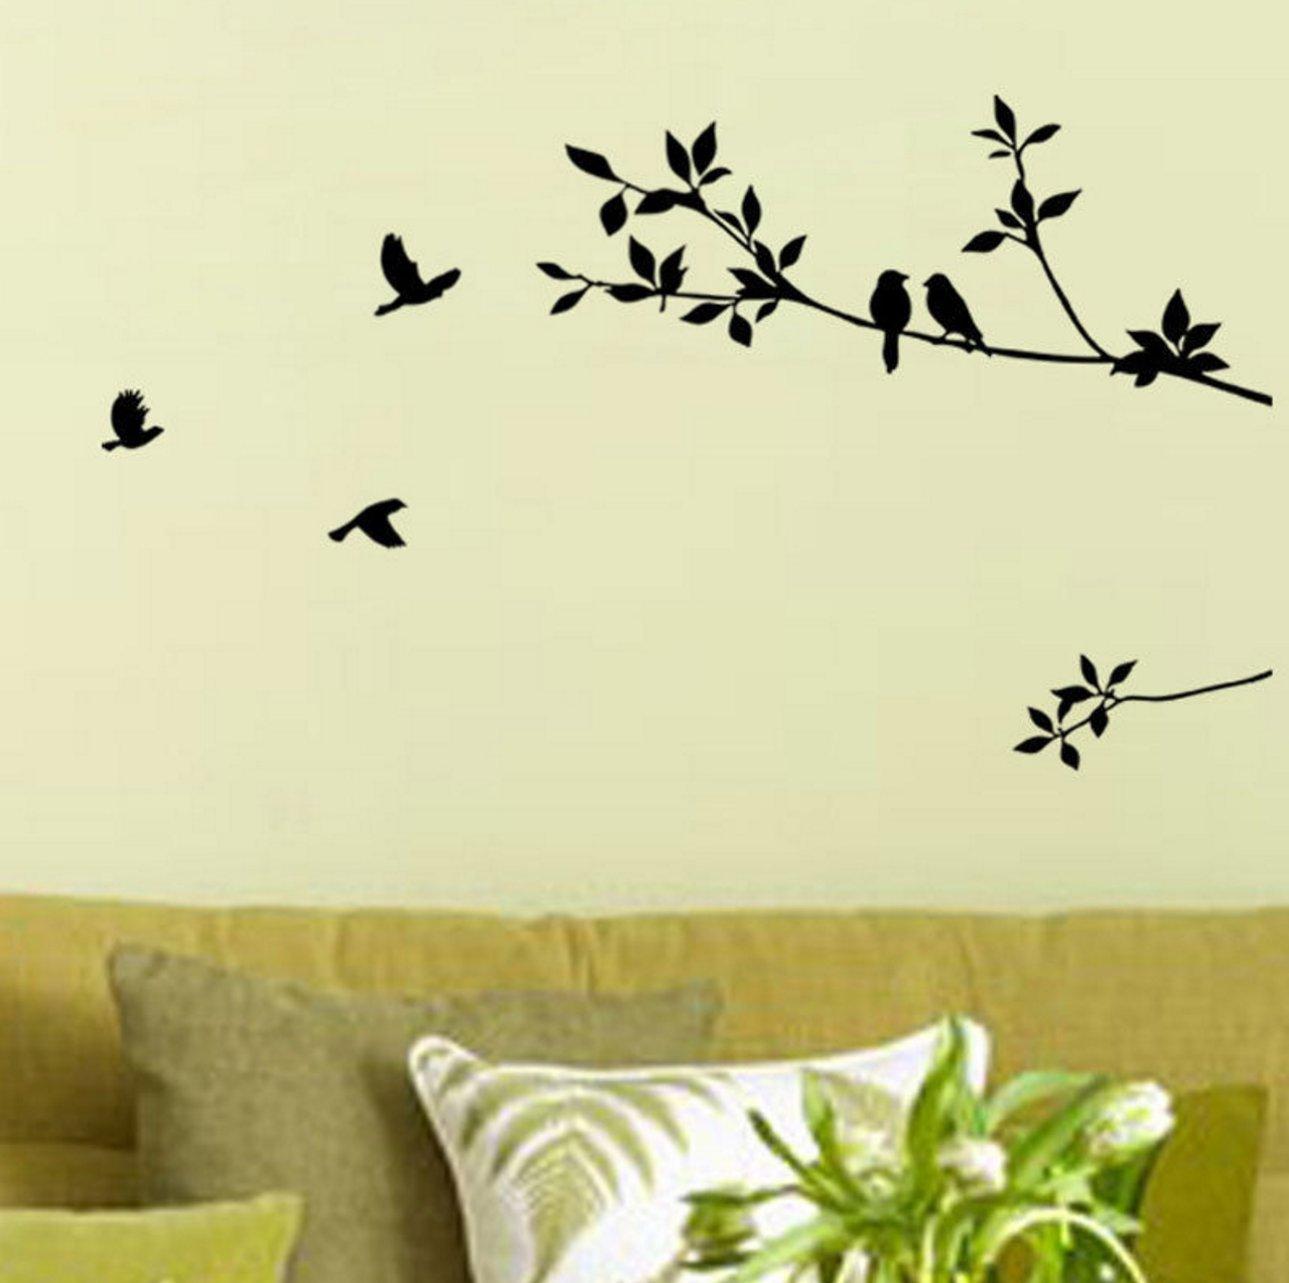 Amazon.com: Elegant Tree and Birds Wall Decal Art Branch Wall ...